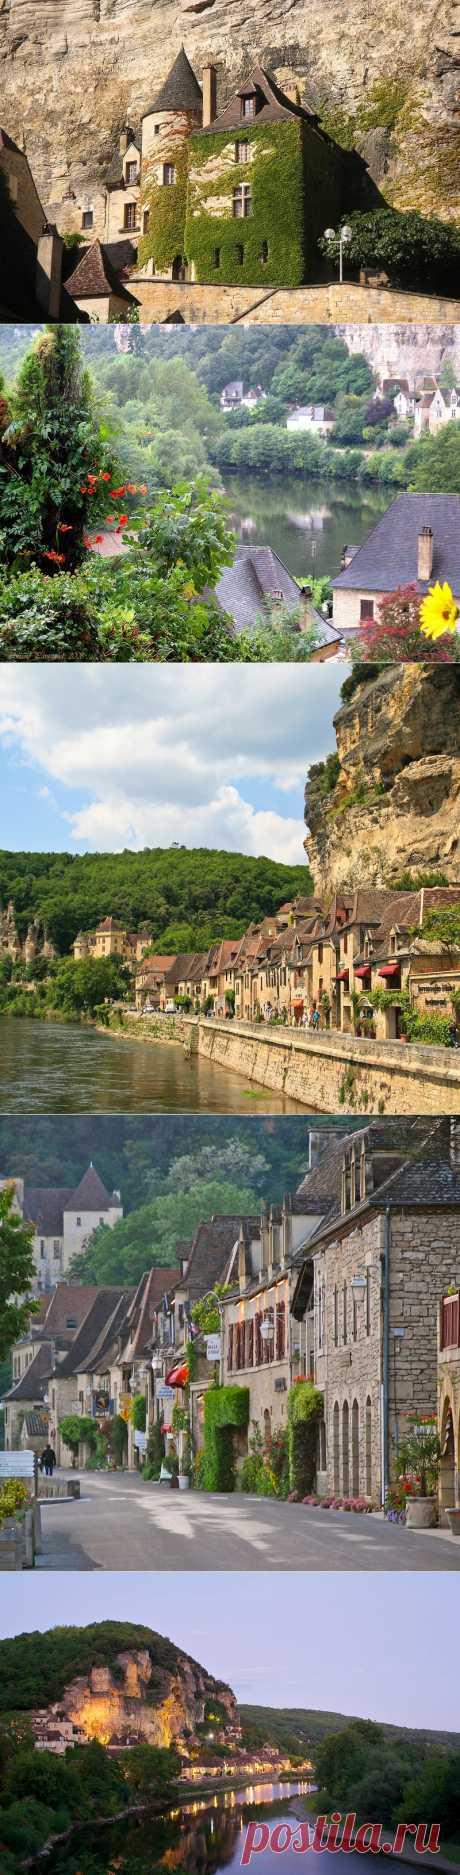 Village of La Roque Gageac (Rock Gazhak). France.